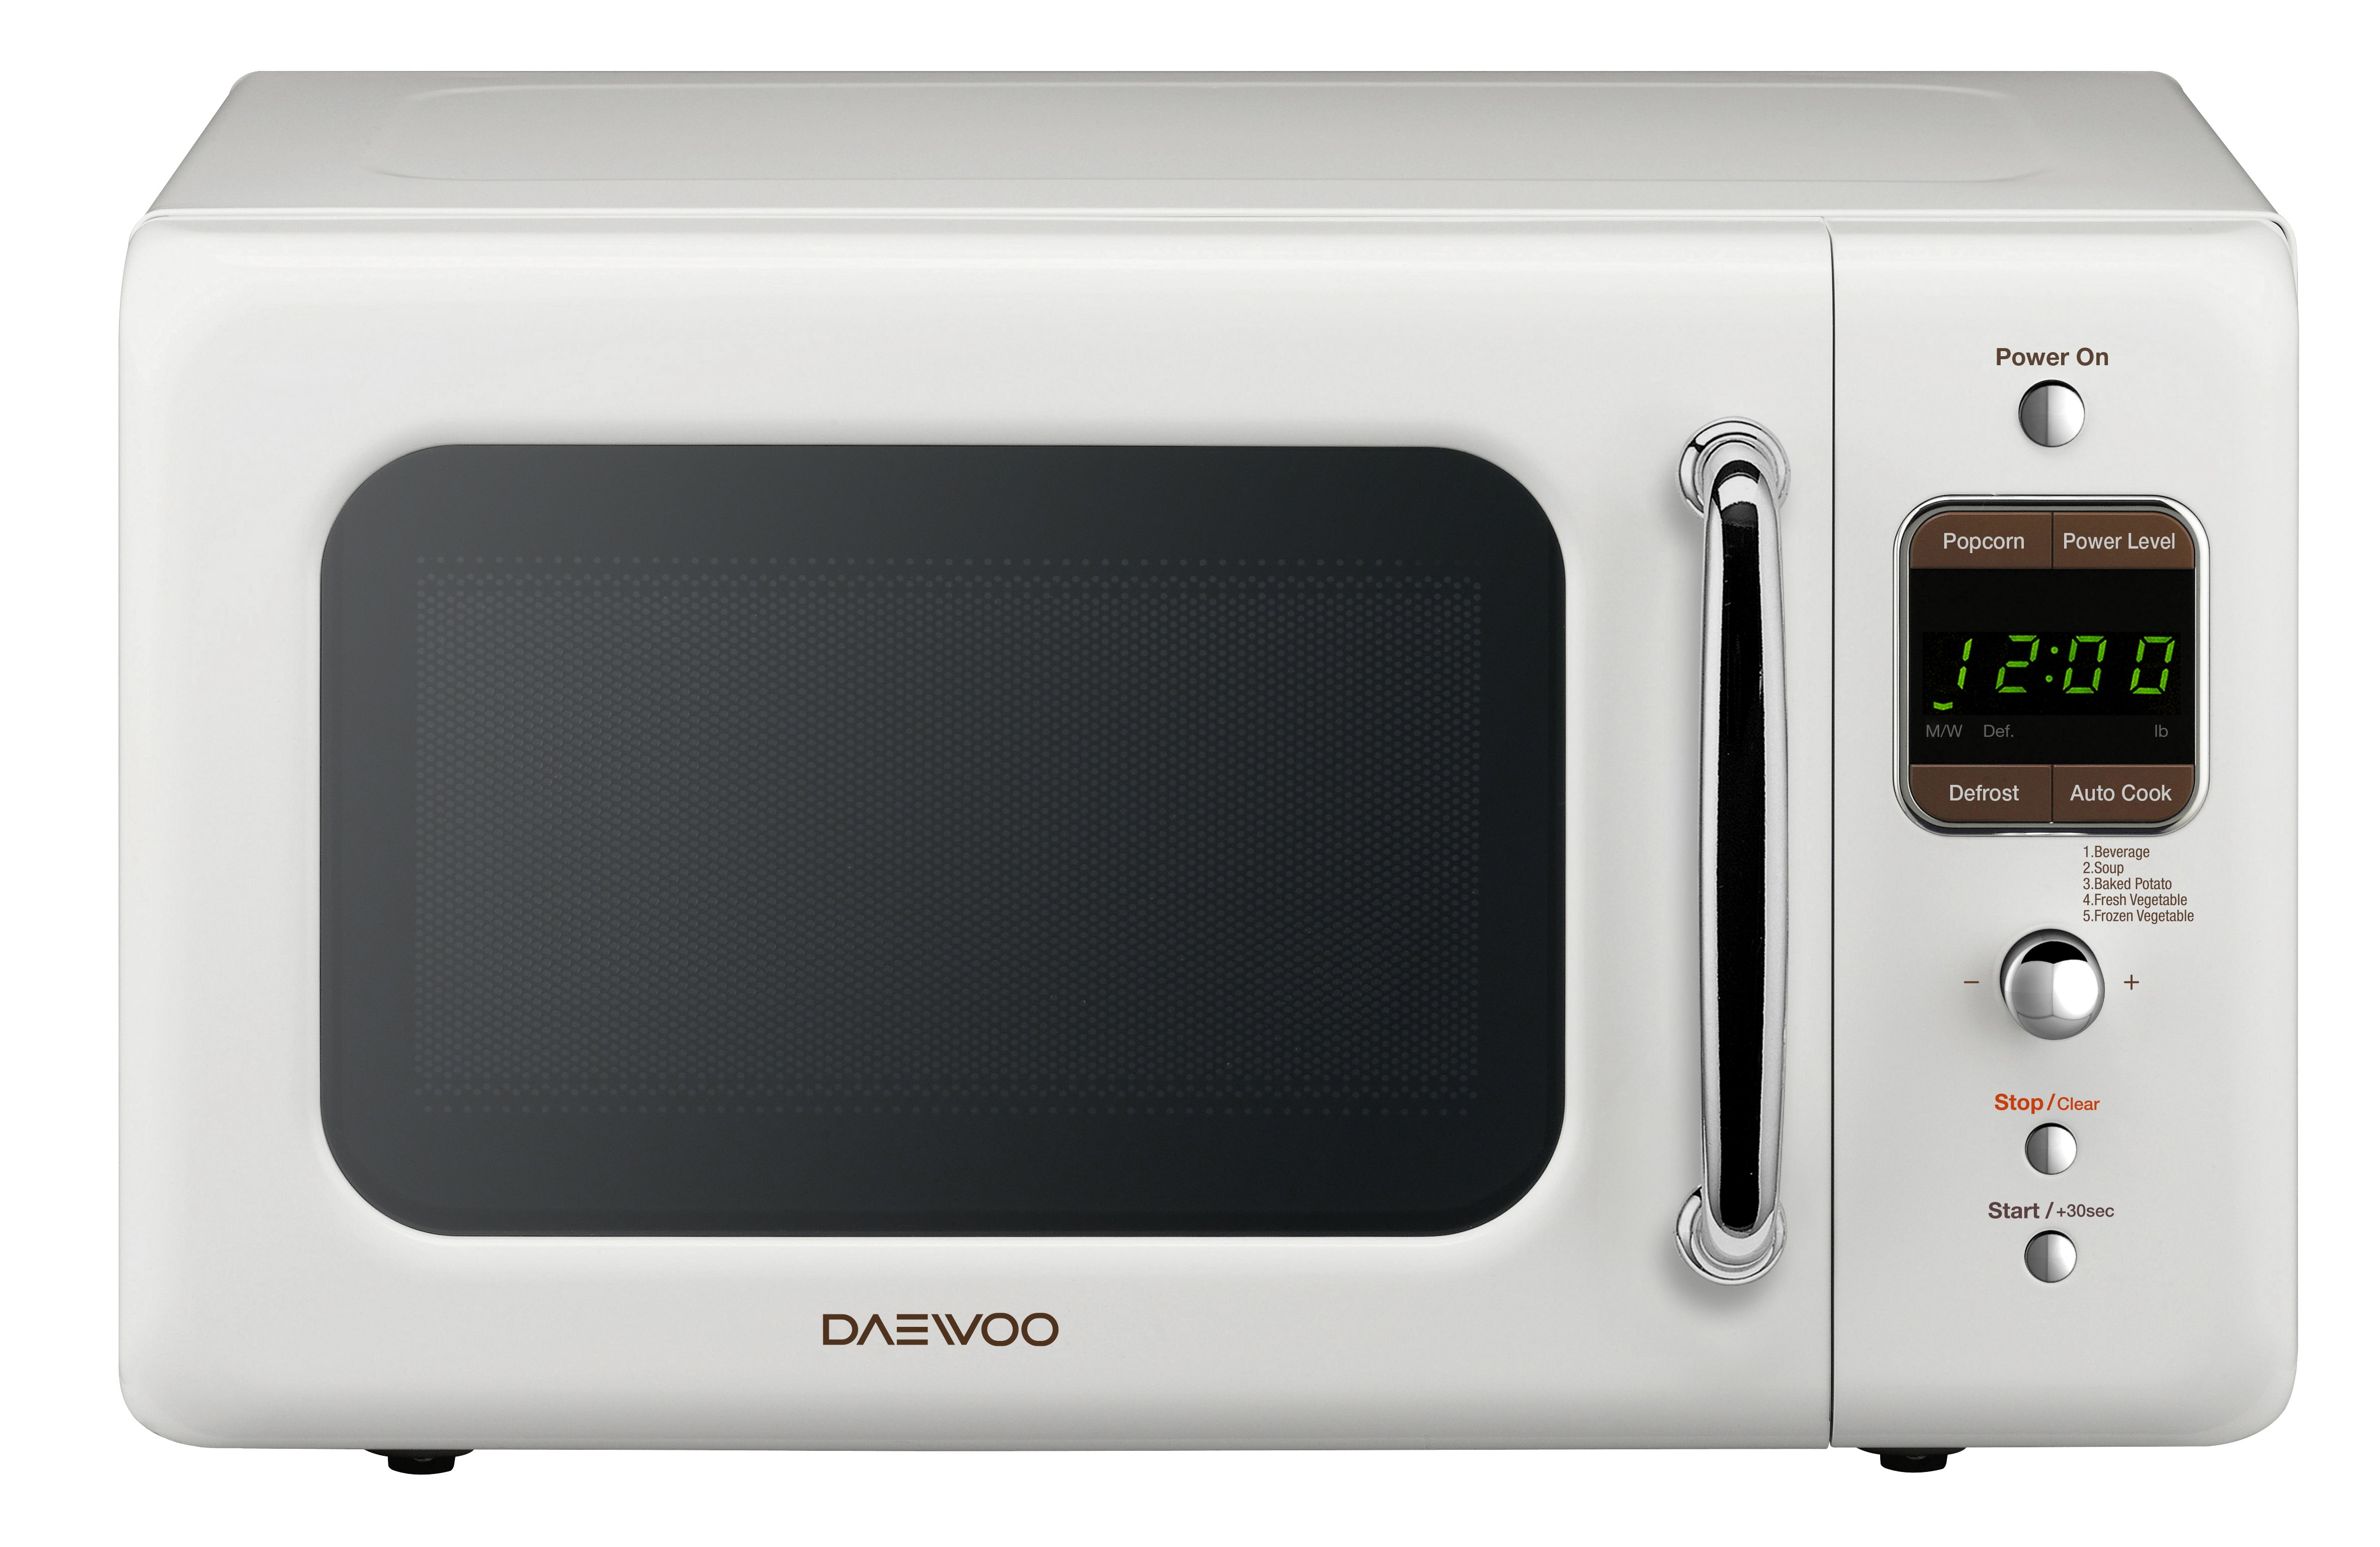 Daewoo 0 7 Cu Ft Retro Microwave Oven Cream White